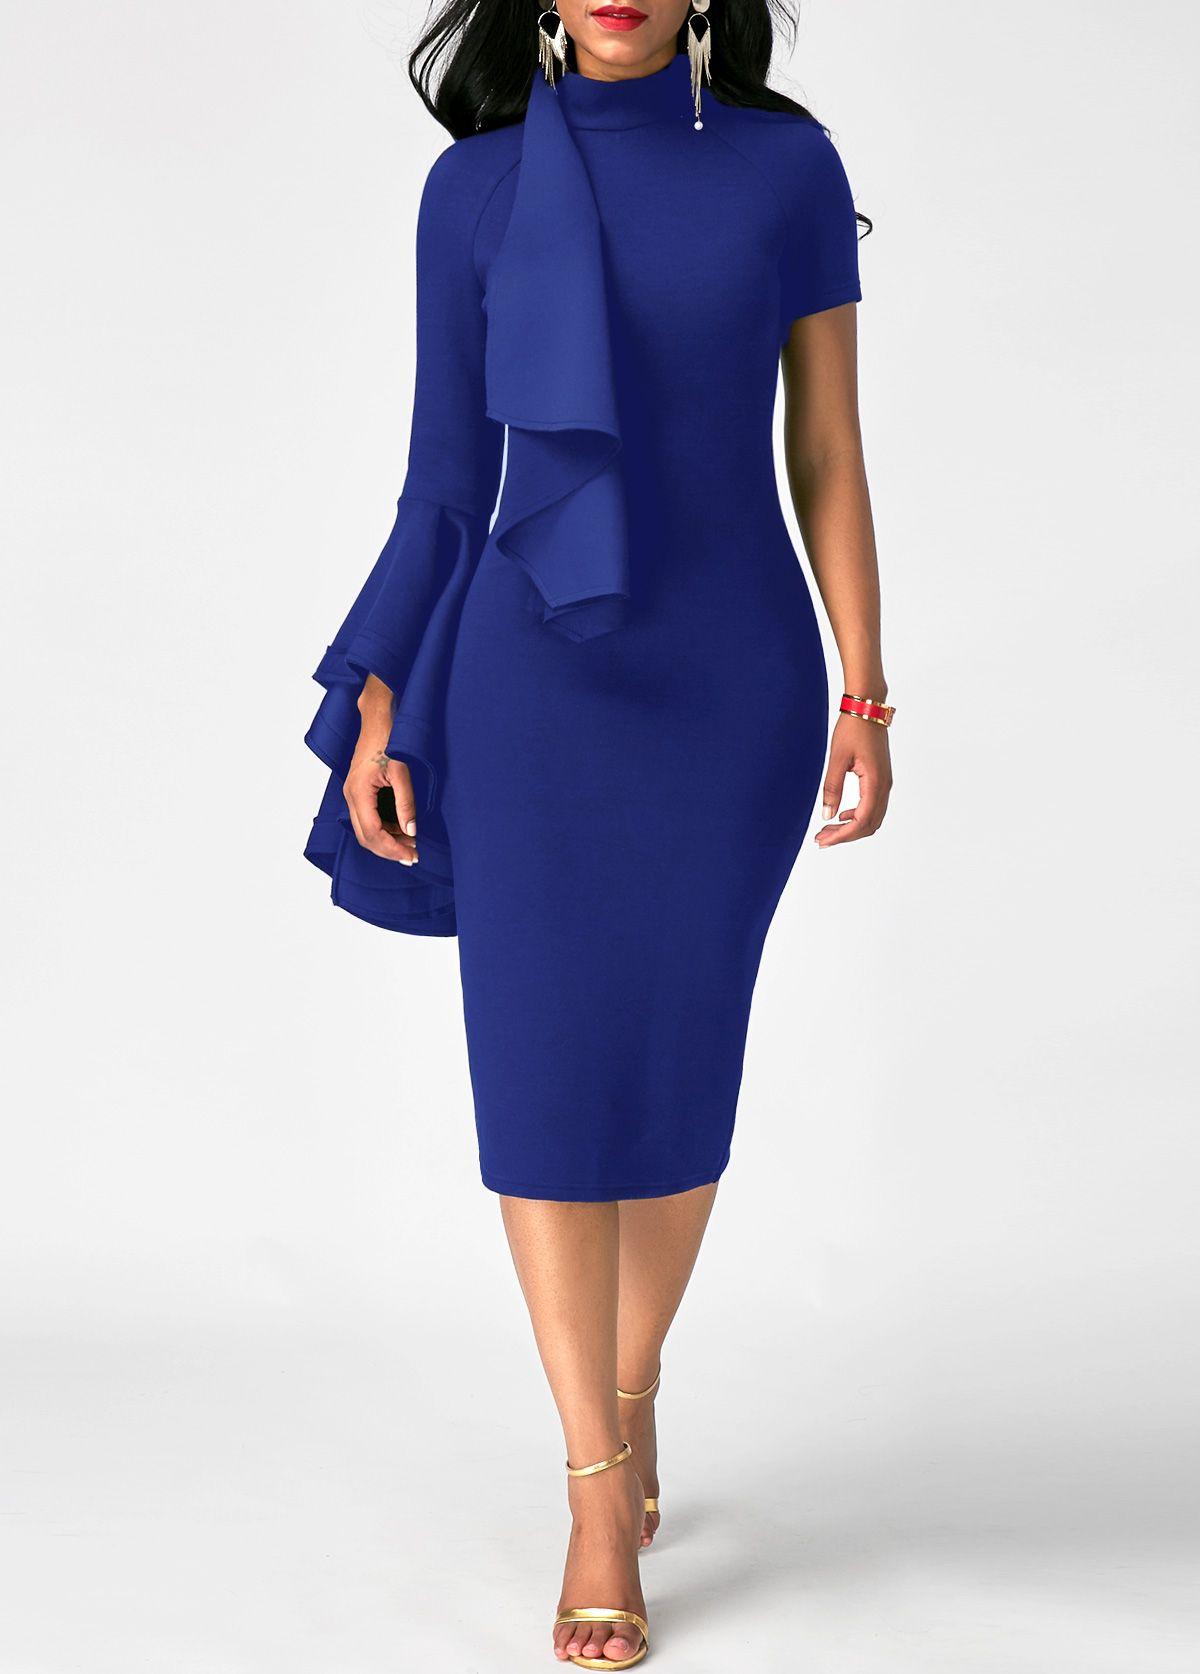 Zipper back high neck flouncing sheath dress on sale only us